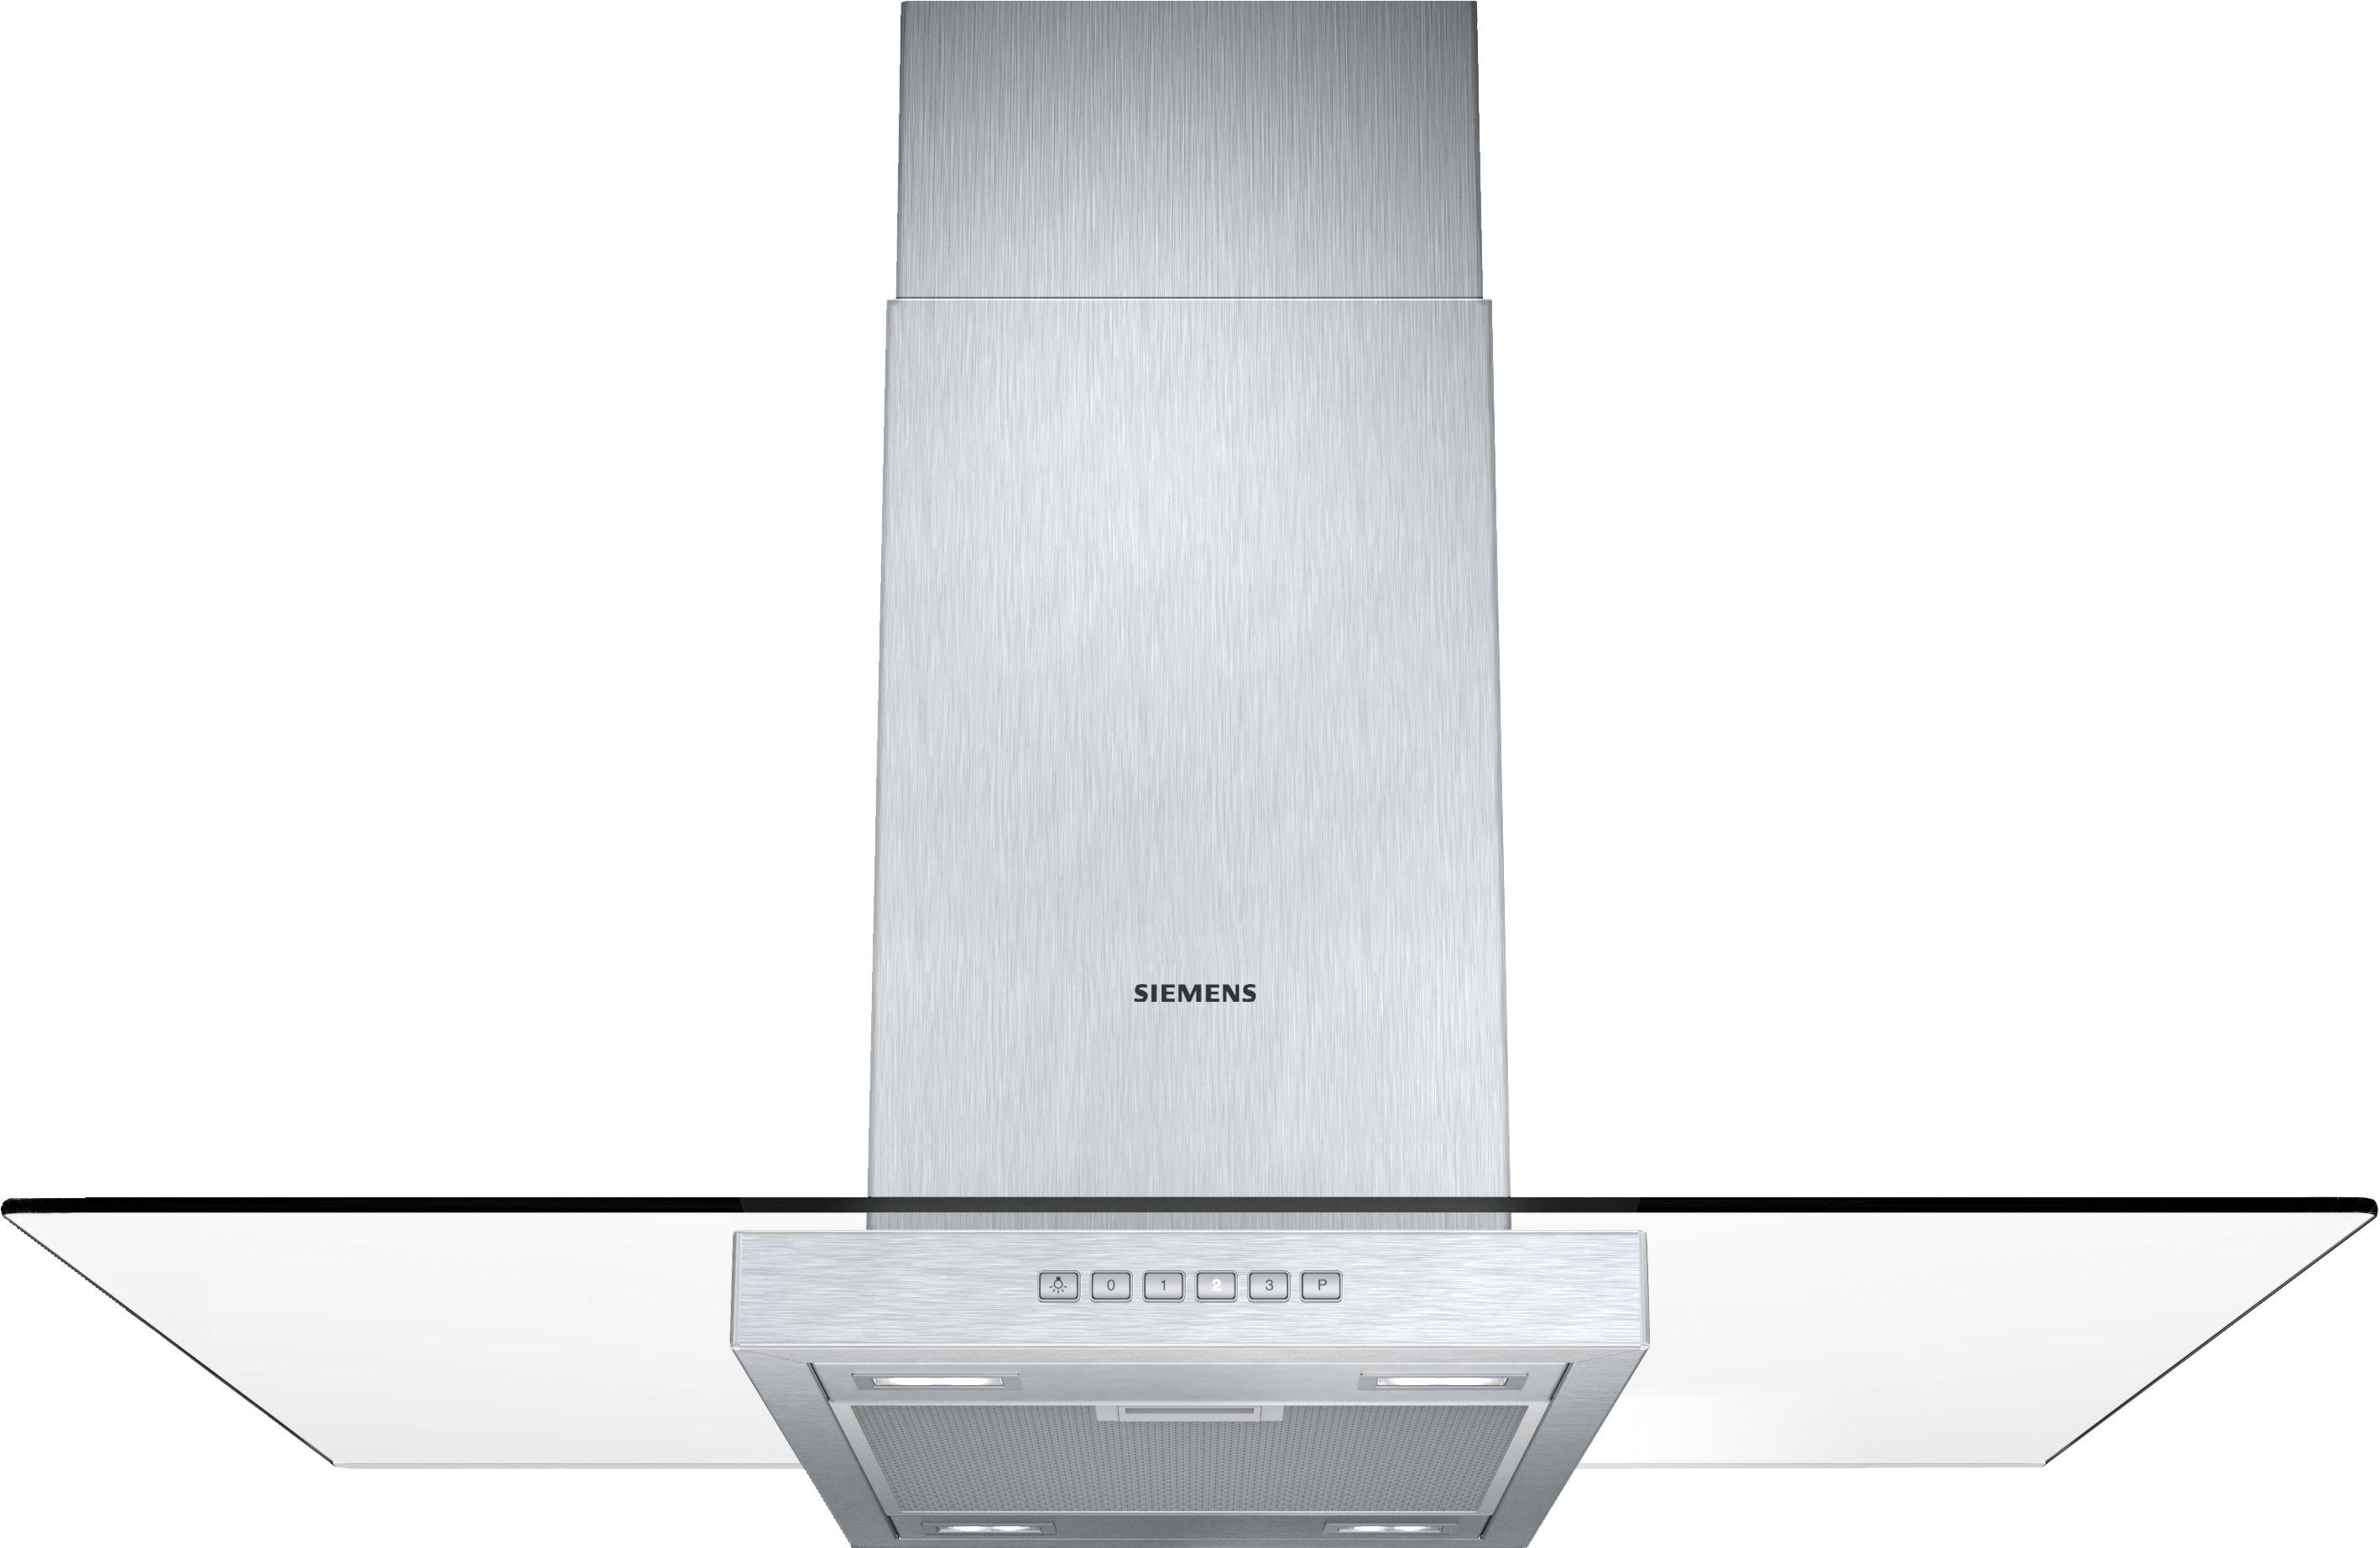 Siemens LF97GA532 Dunstabzugshaube/Inselesse 90cm 57dB 670m³/h LED für 824,00 Euro